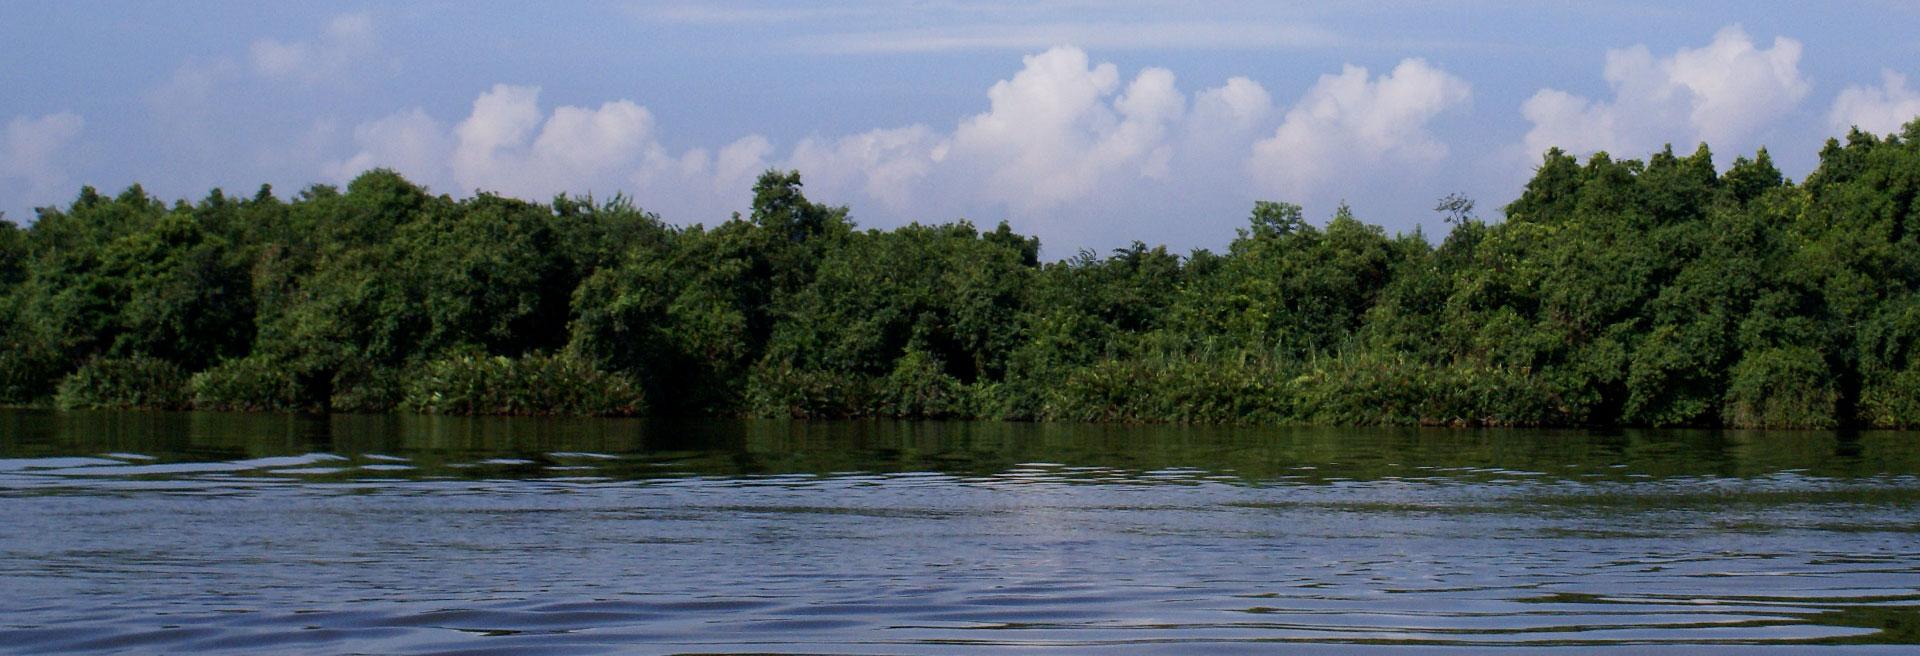 river facing the mangroves